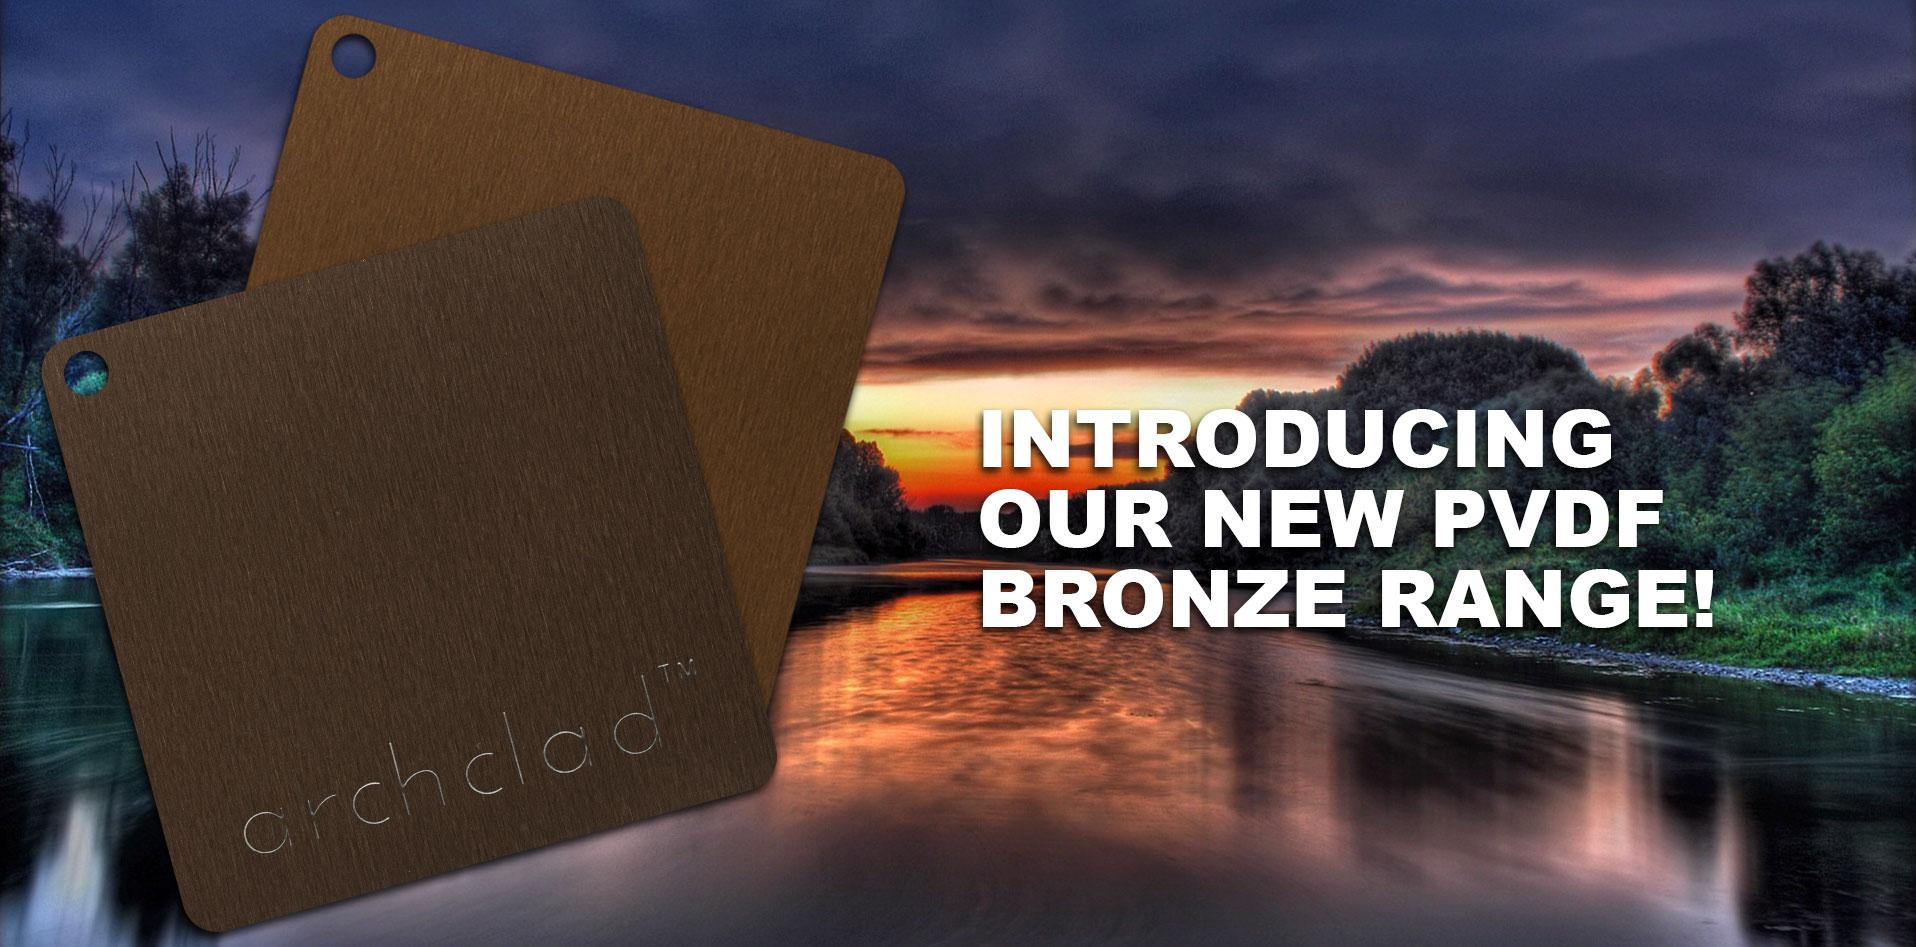 archclad-new-bronze-range.jpg